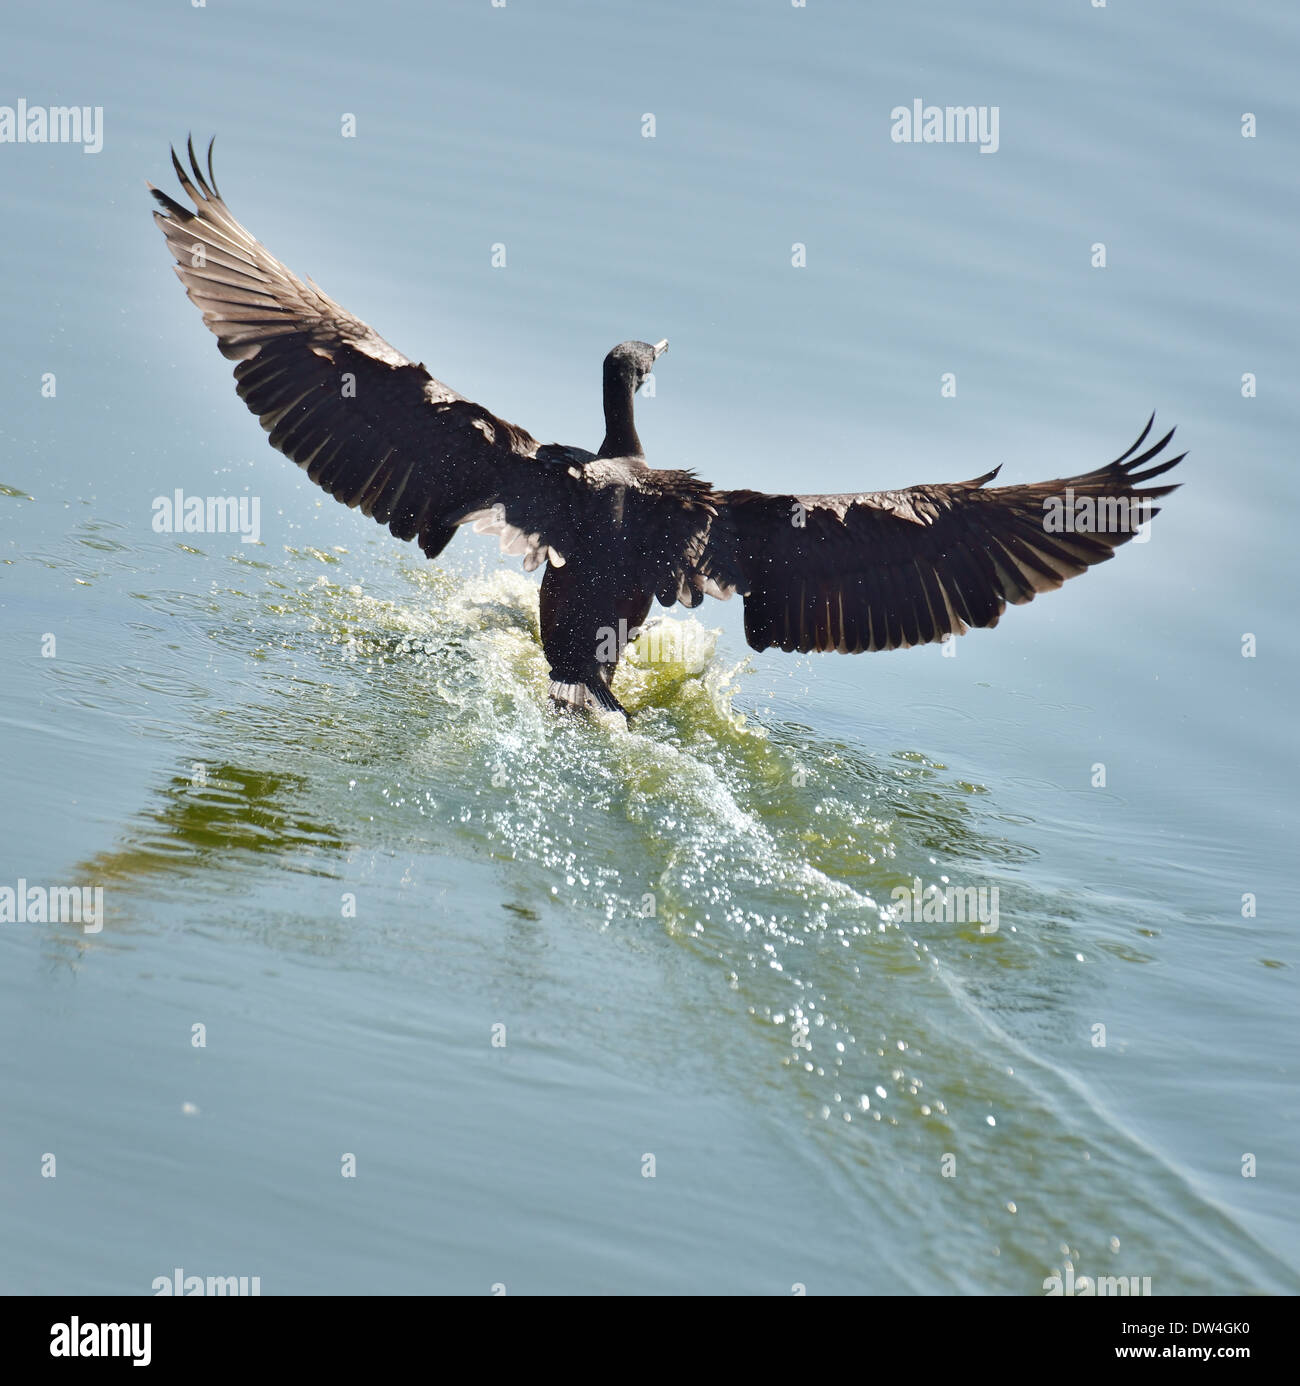 Black Cormorant Landing On Water - Stock Image